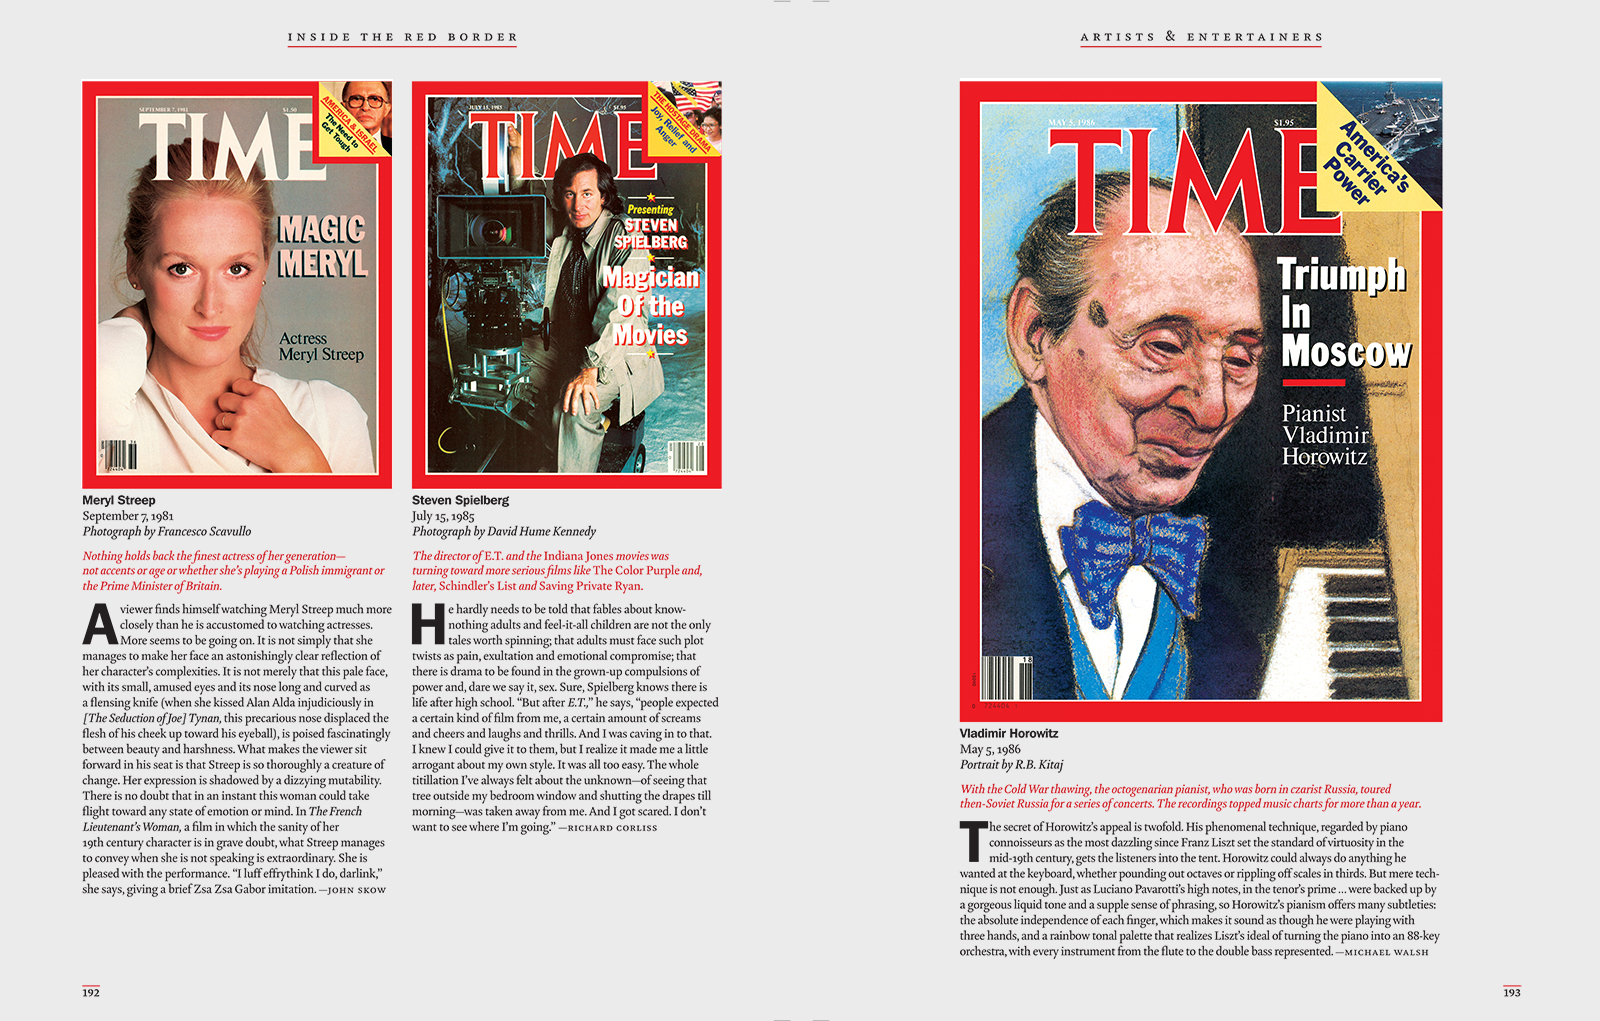 TIME_BK_INSIDE-THE-RED-BORDER_arts_spr7.jpg